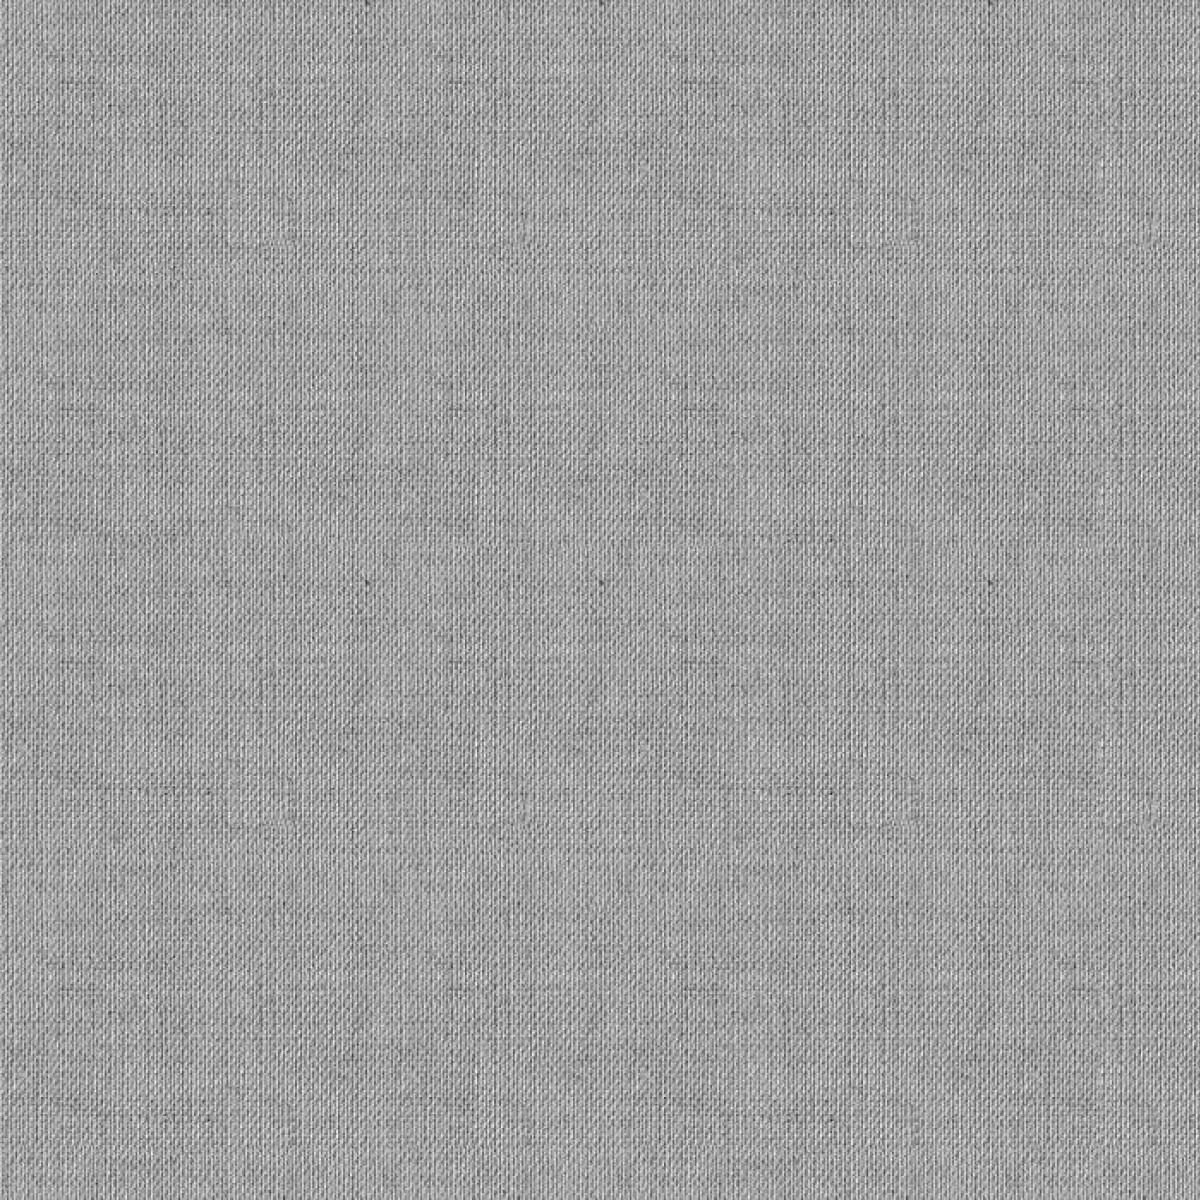 Fototapet Linen Grey, personalizat, Photowall